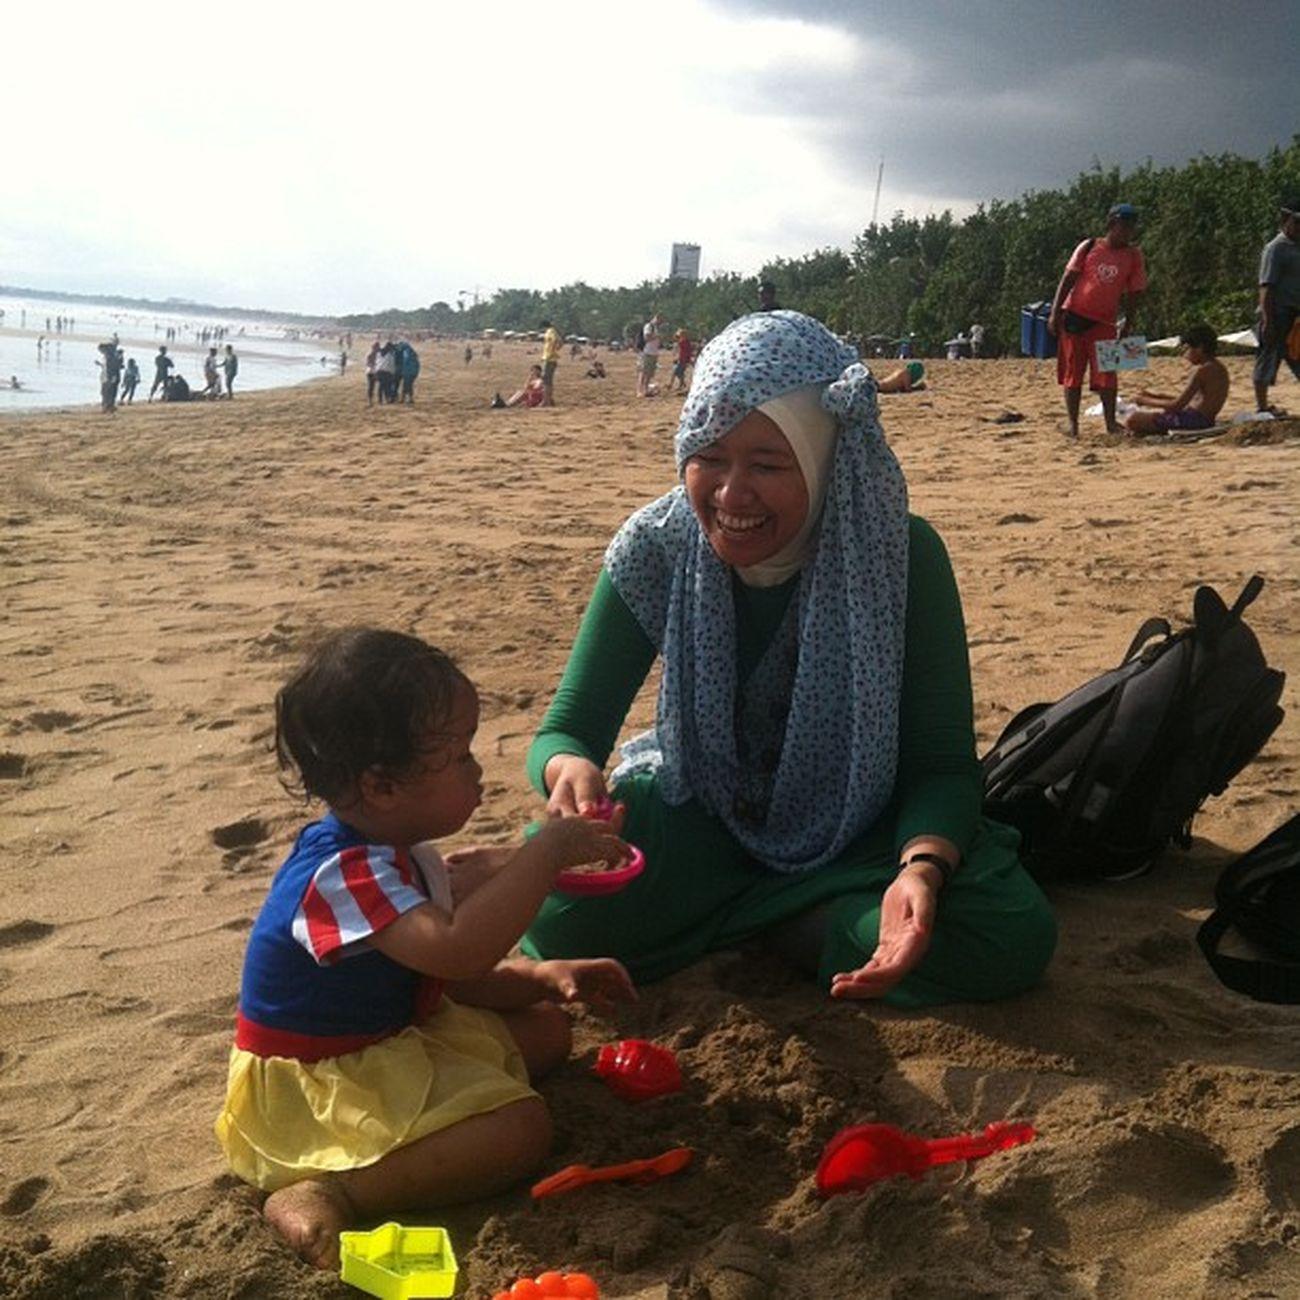 Bikin istana pasir with syahla Beach Bali Babies